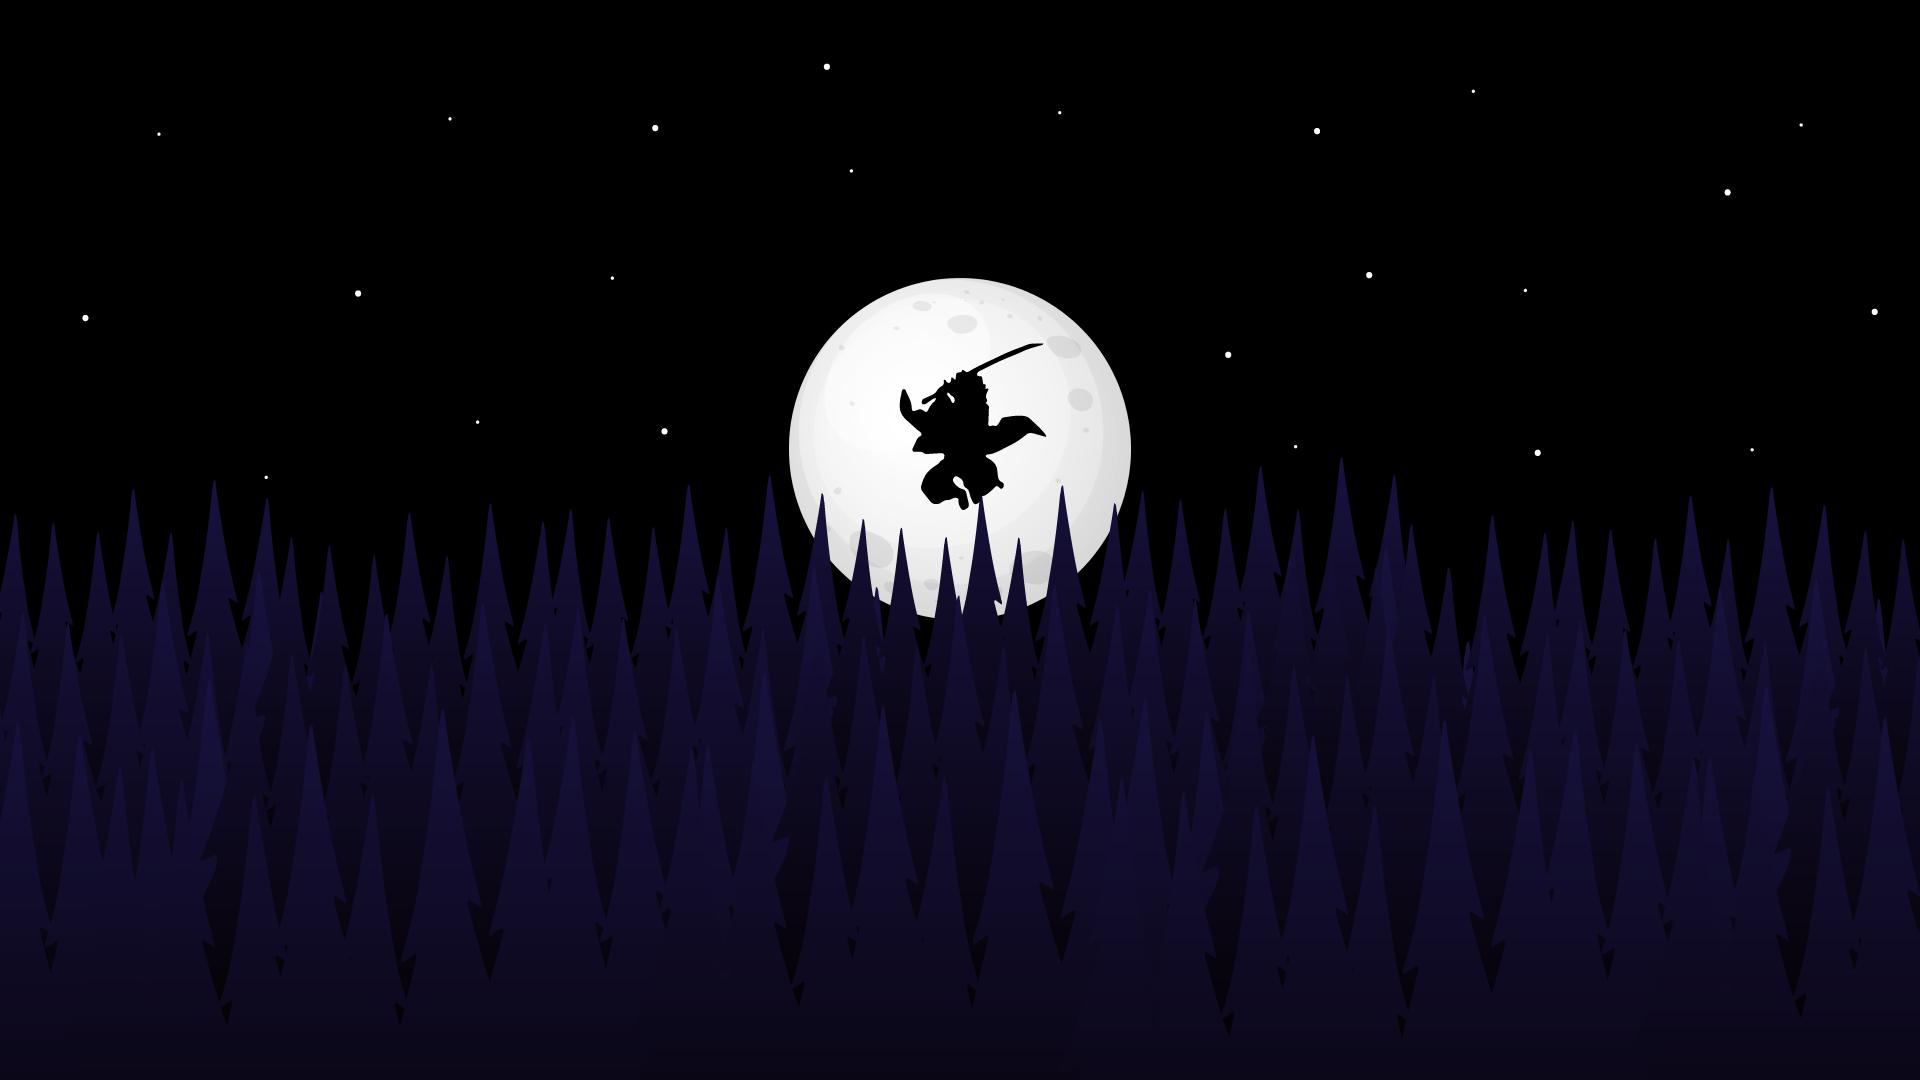 demon slayer anime wallpaper 4k tanjiro kamado silhouette forest night full moon